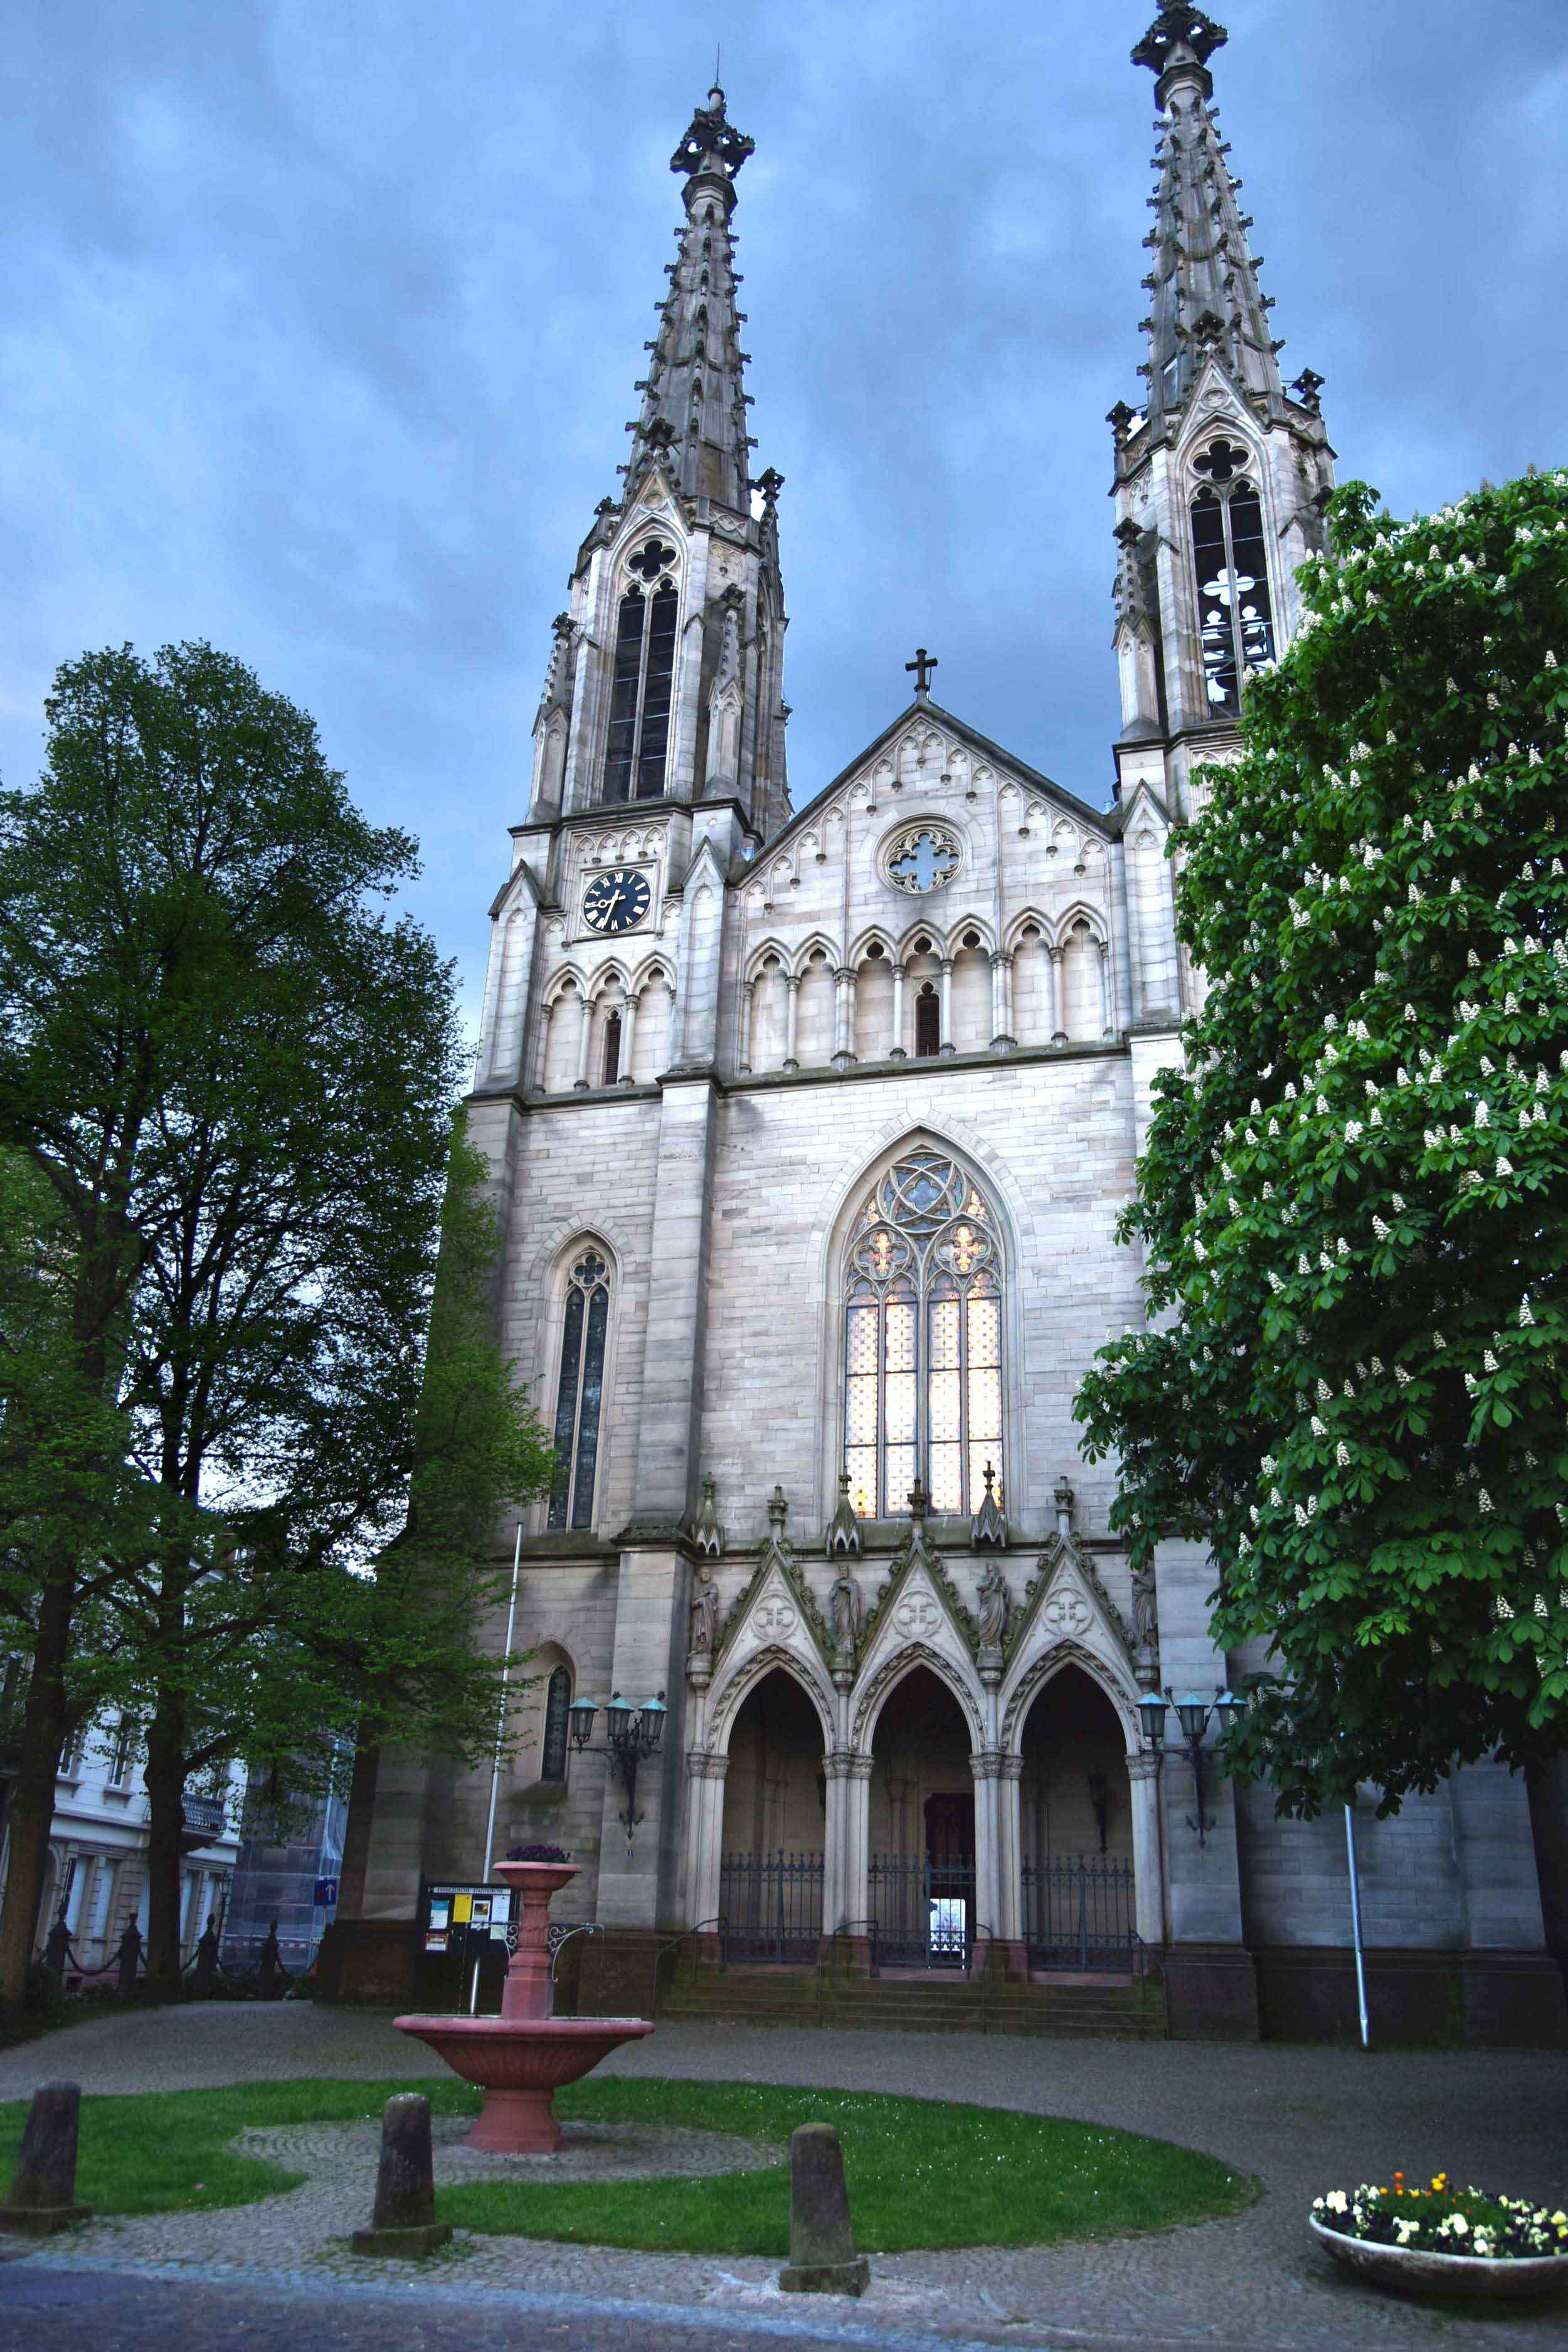 Cathedral,Russian Church, Baden Baden, Germany. Image©thingstodot.com